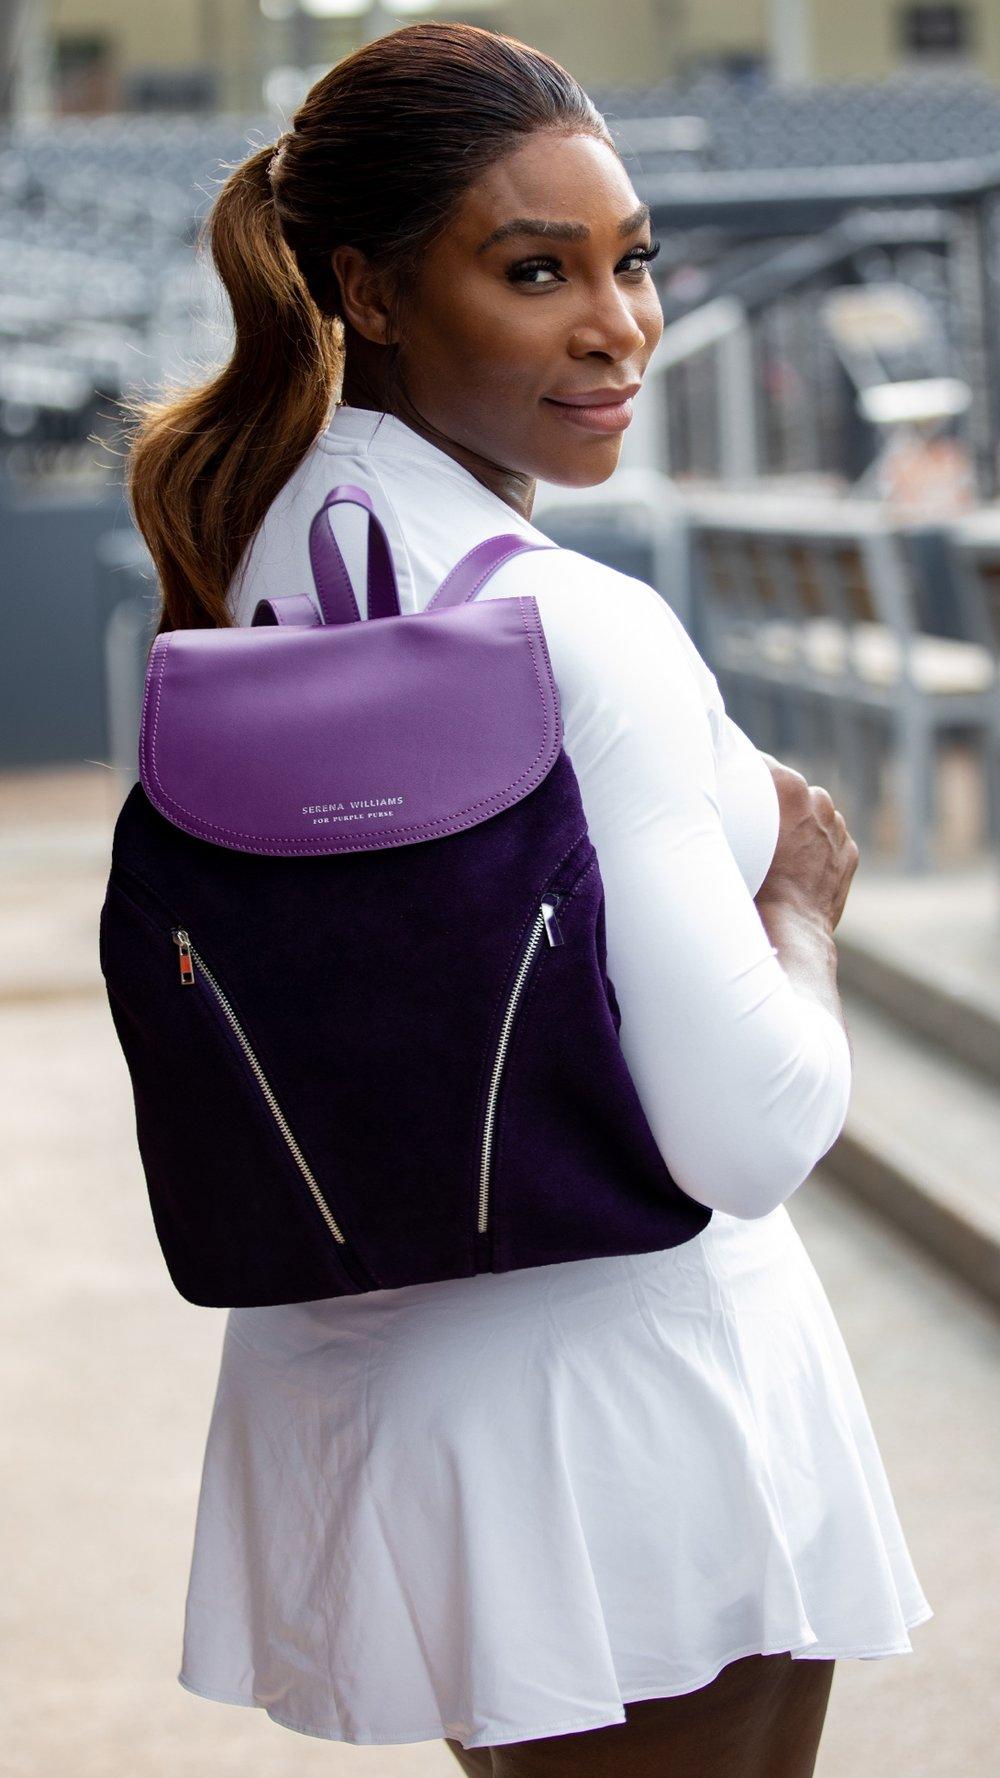 purse b.JPG